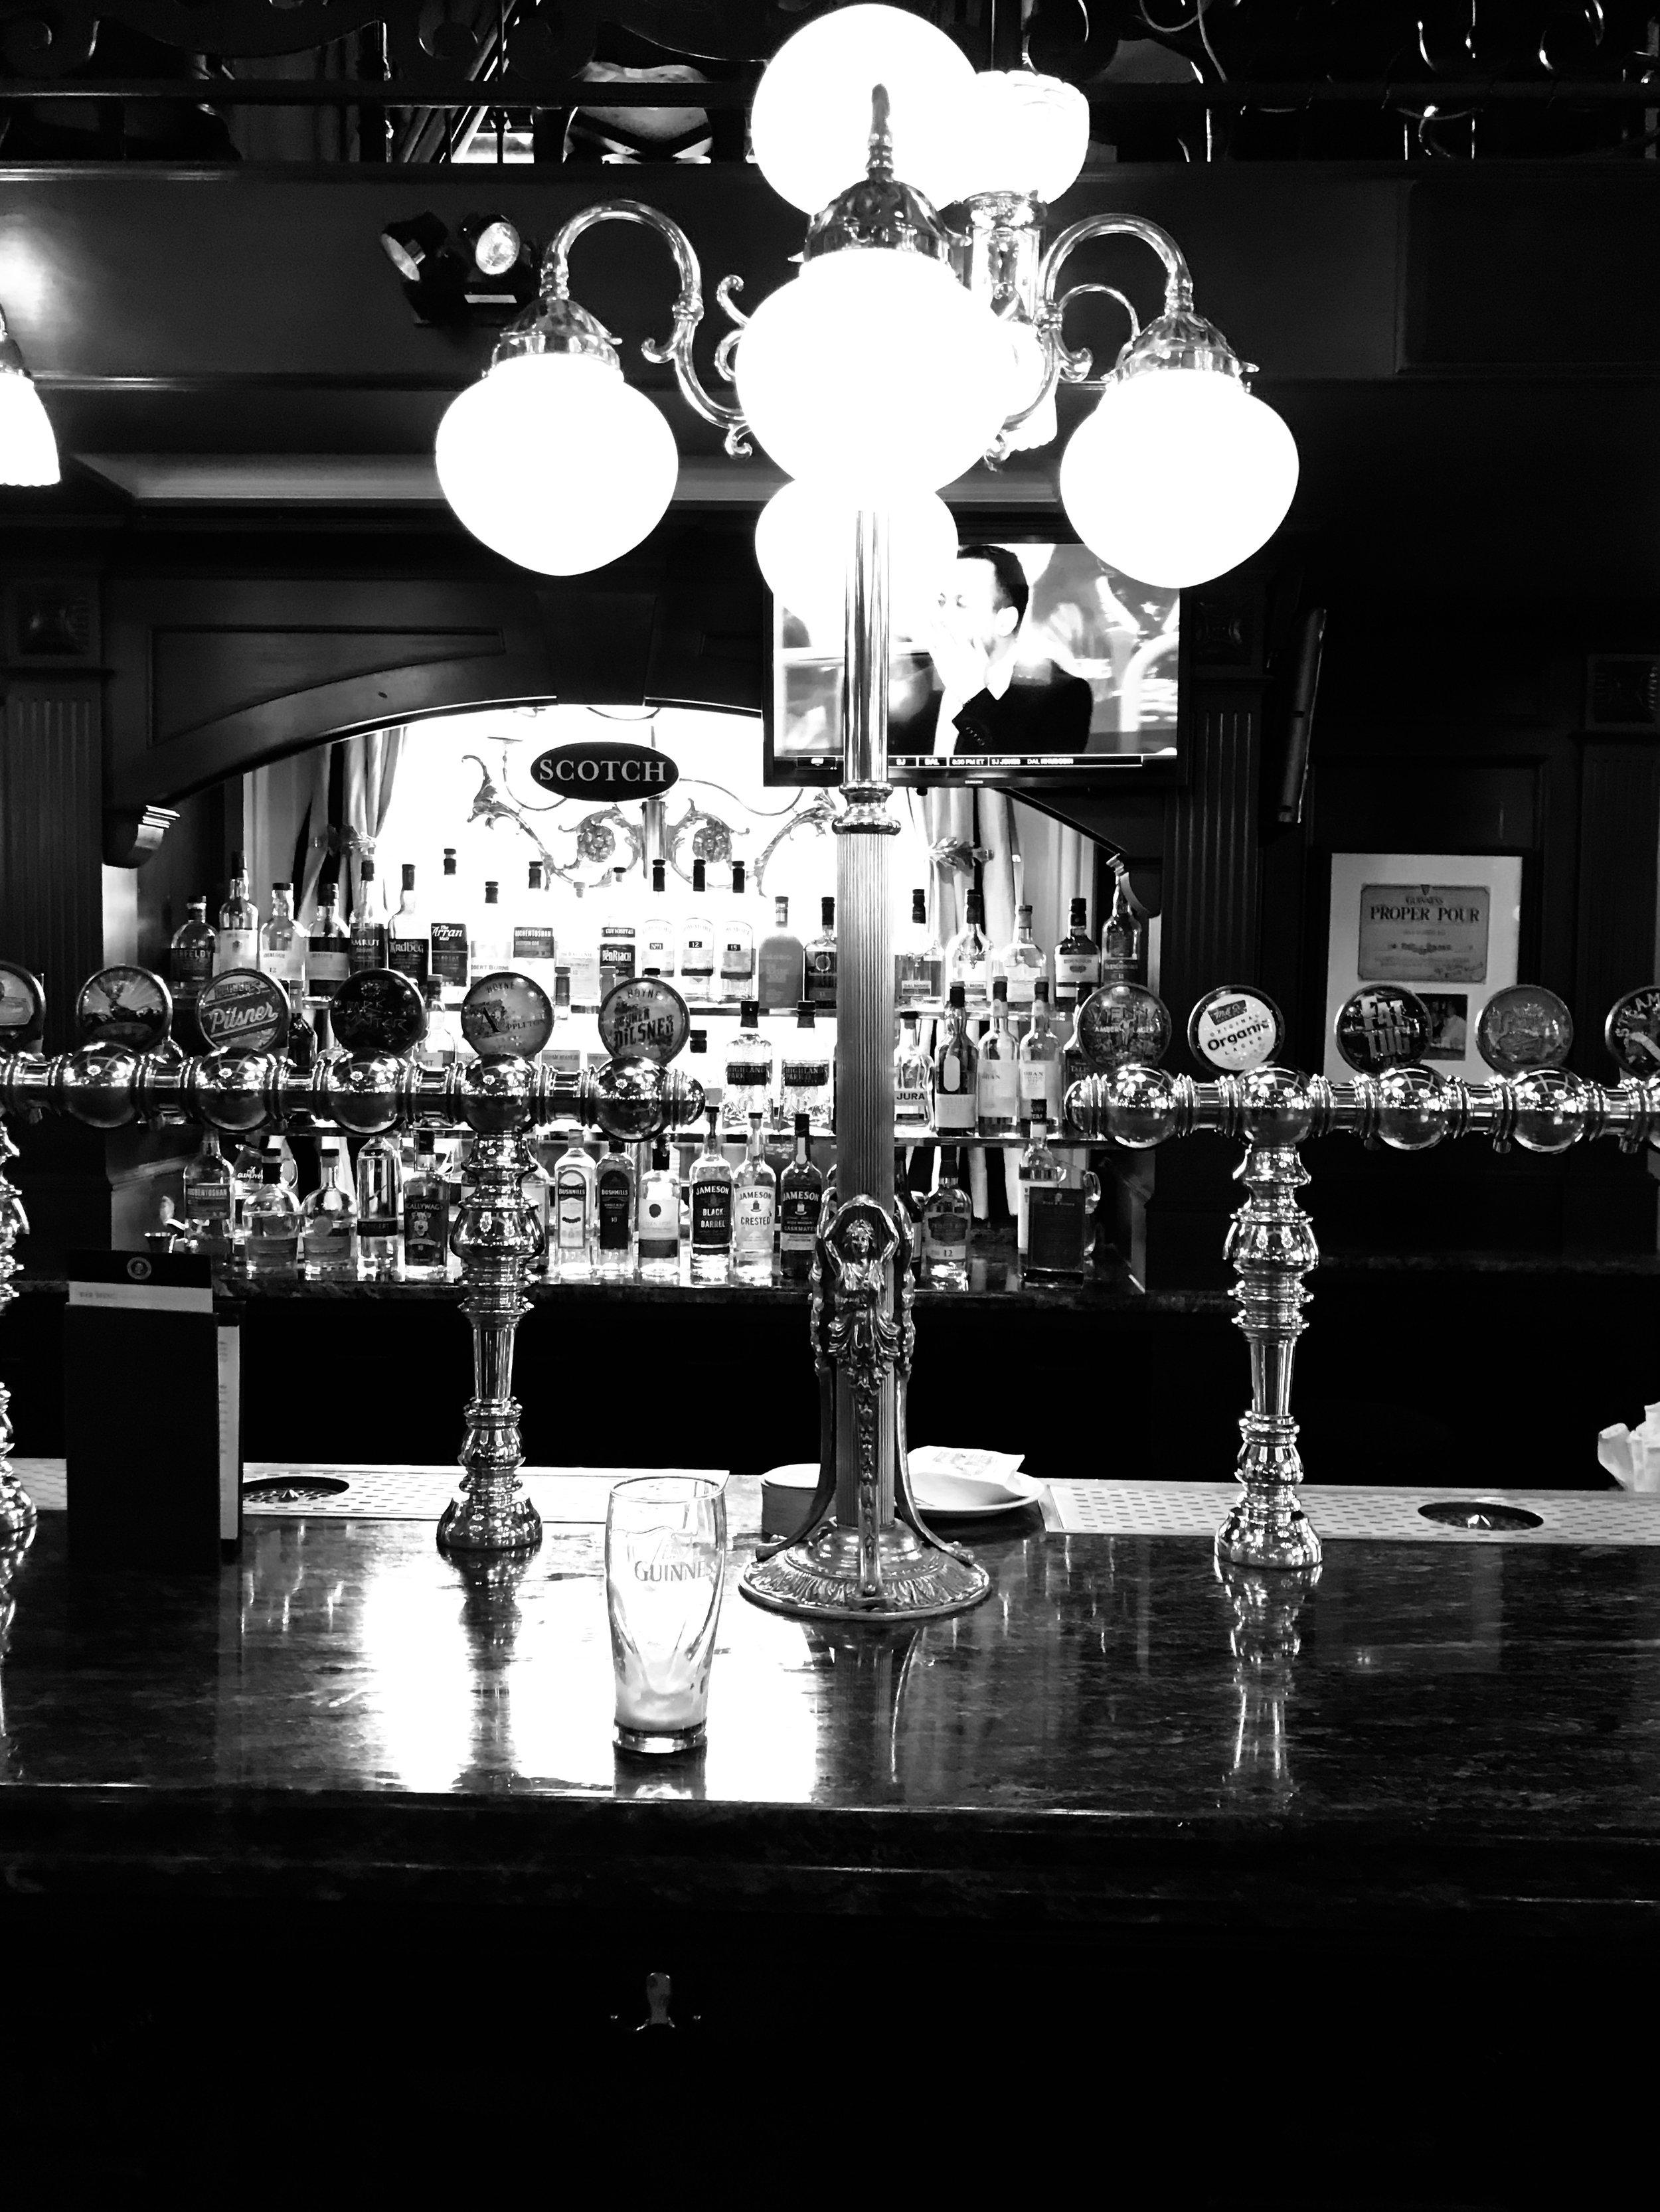 Beautiful pubs plus beautiful pints = beauty!